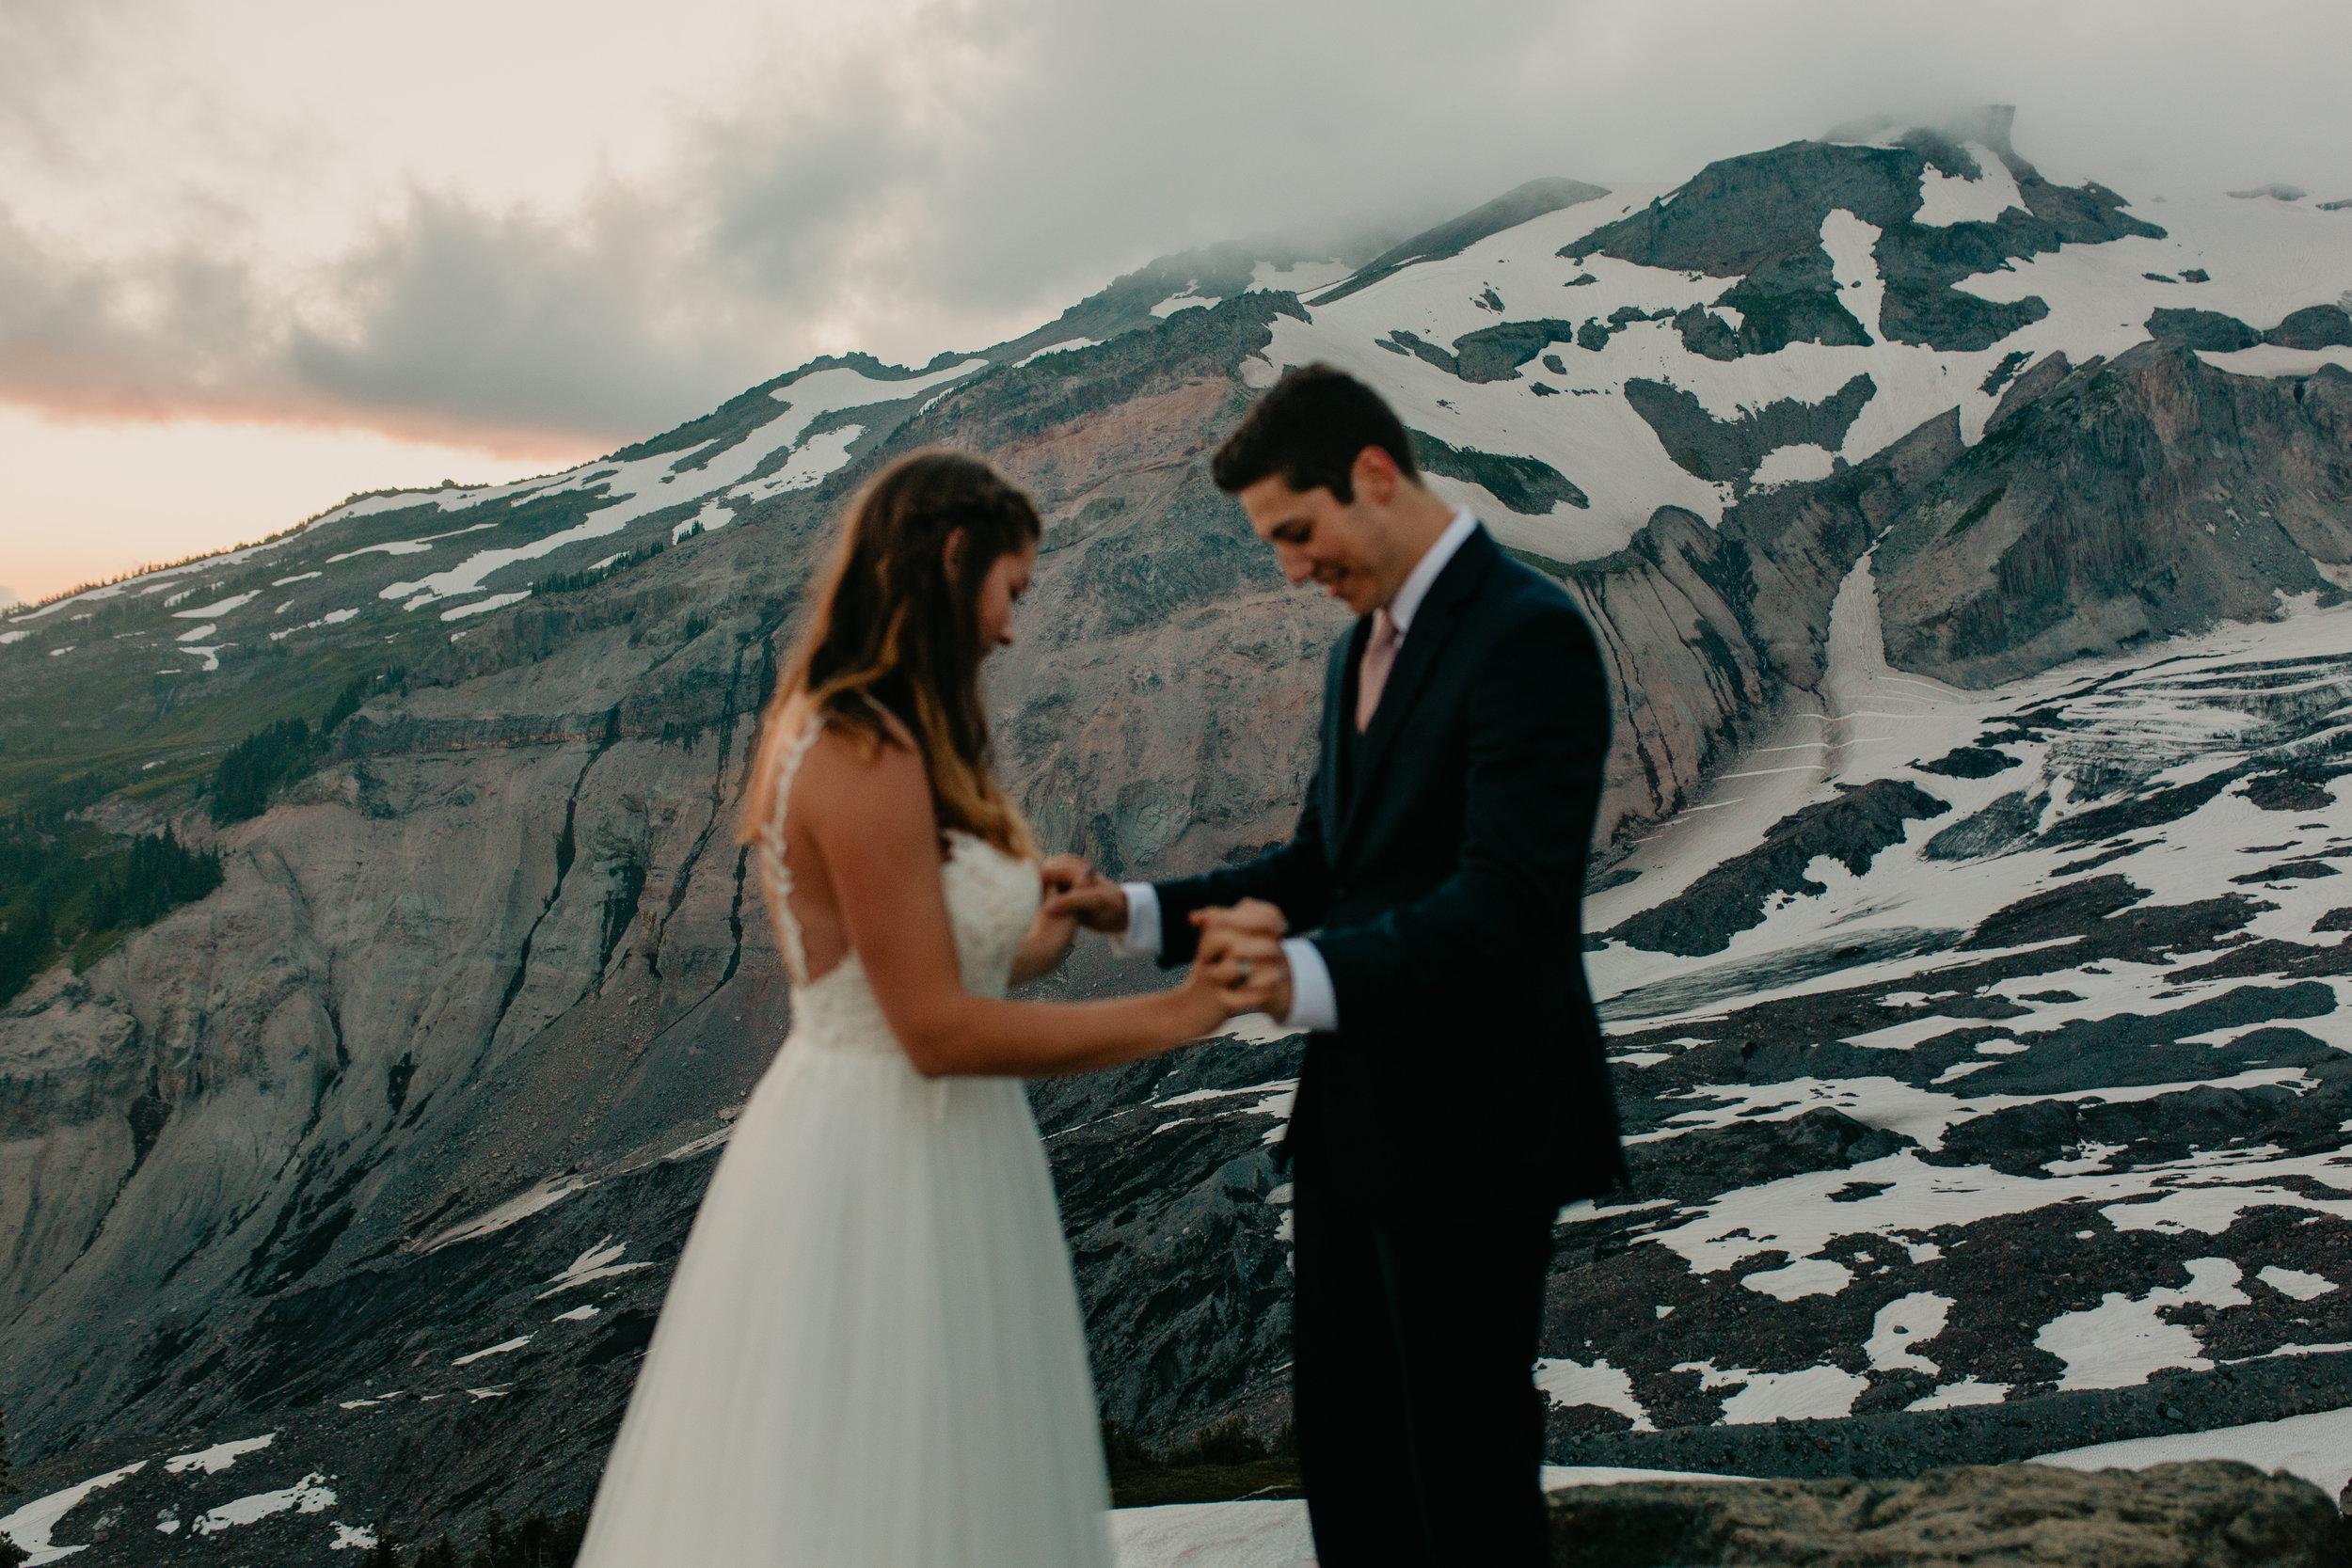 Nicole-Daacke-Photography-Mt-Rainier-elopement-photographer-washington-mountain-epic-wedding-photography-wildflowers-at-rainier-pine-tree-cloudy-summer-day-at-mountain-rainier-62.jpg